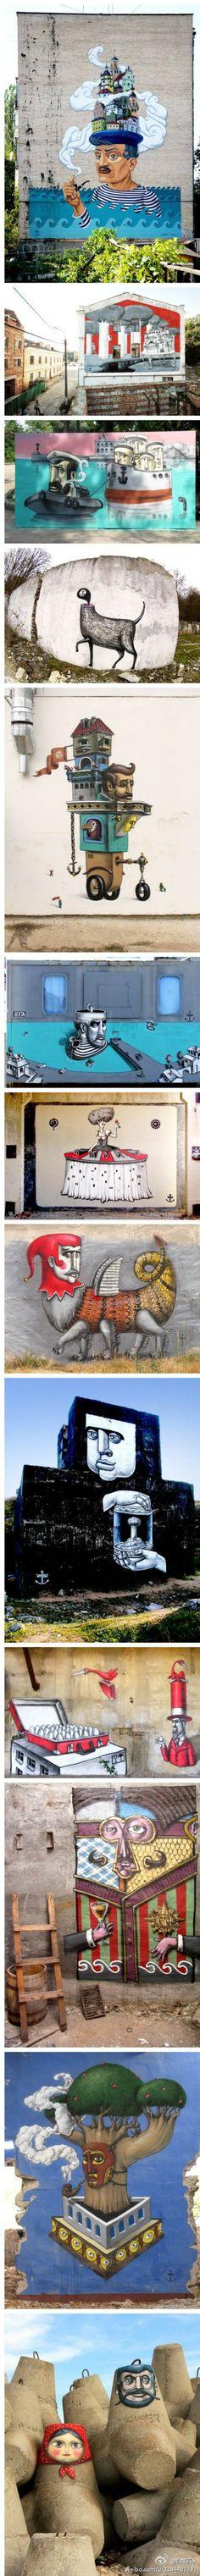 Artist :Kislow / Surreal Street Art